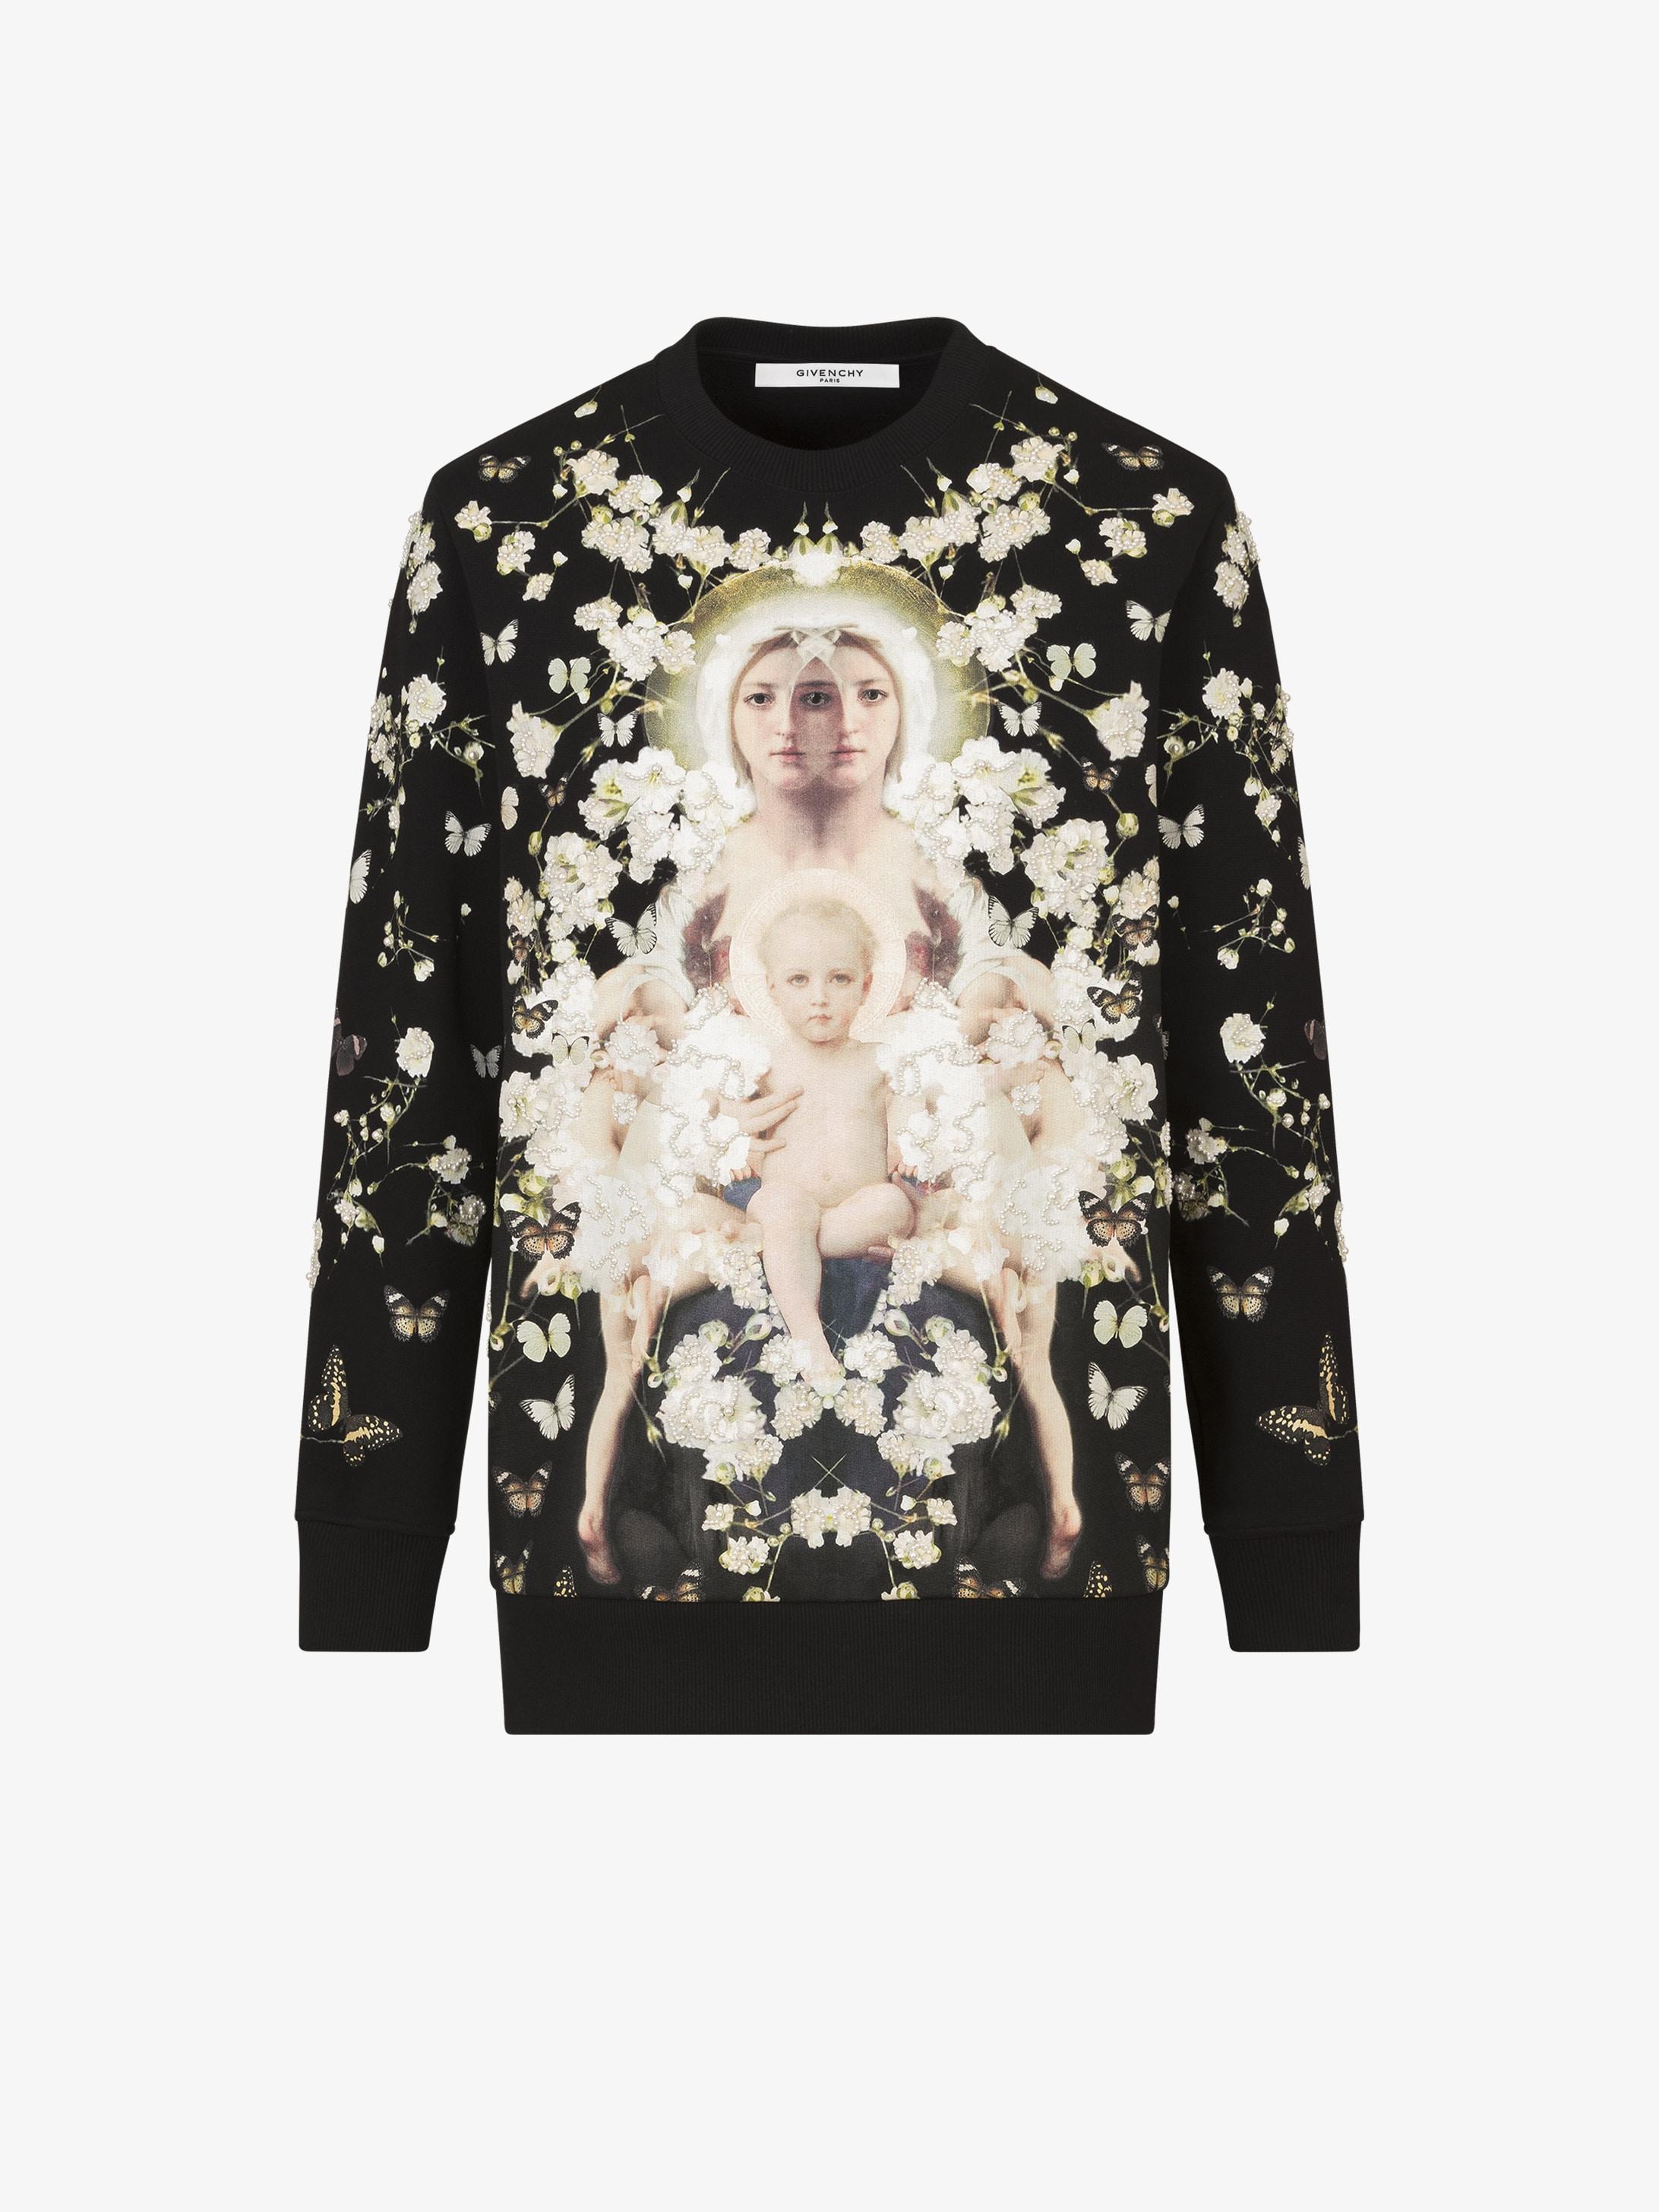 Baby's breath Madonna刺绣运动衫